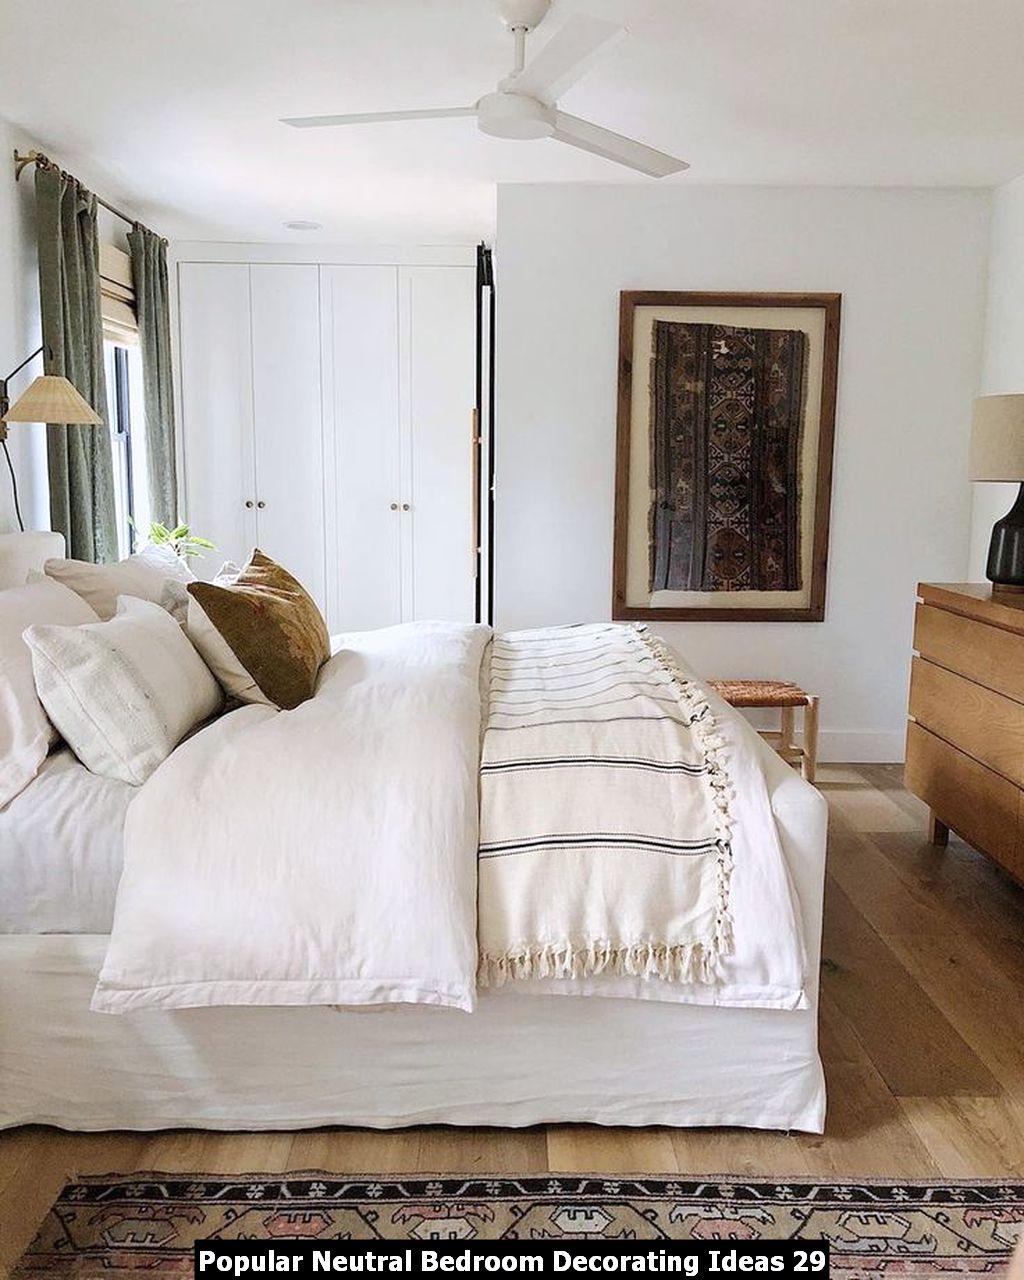 Popular Neutral Bedroom Decorating Ideas 29